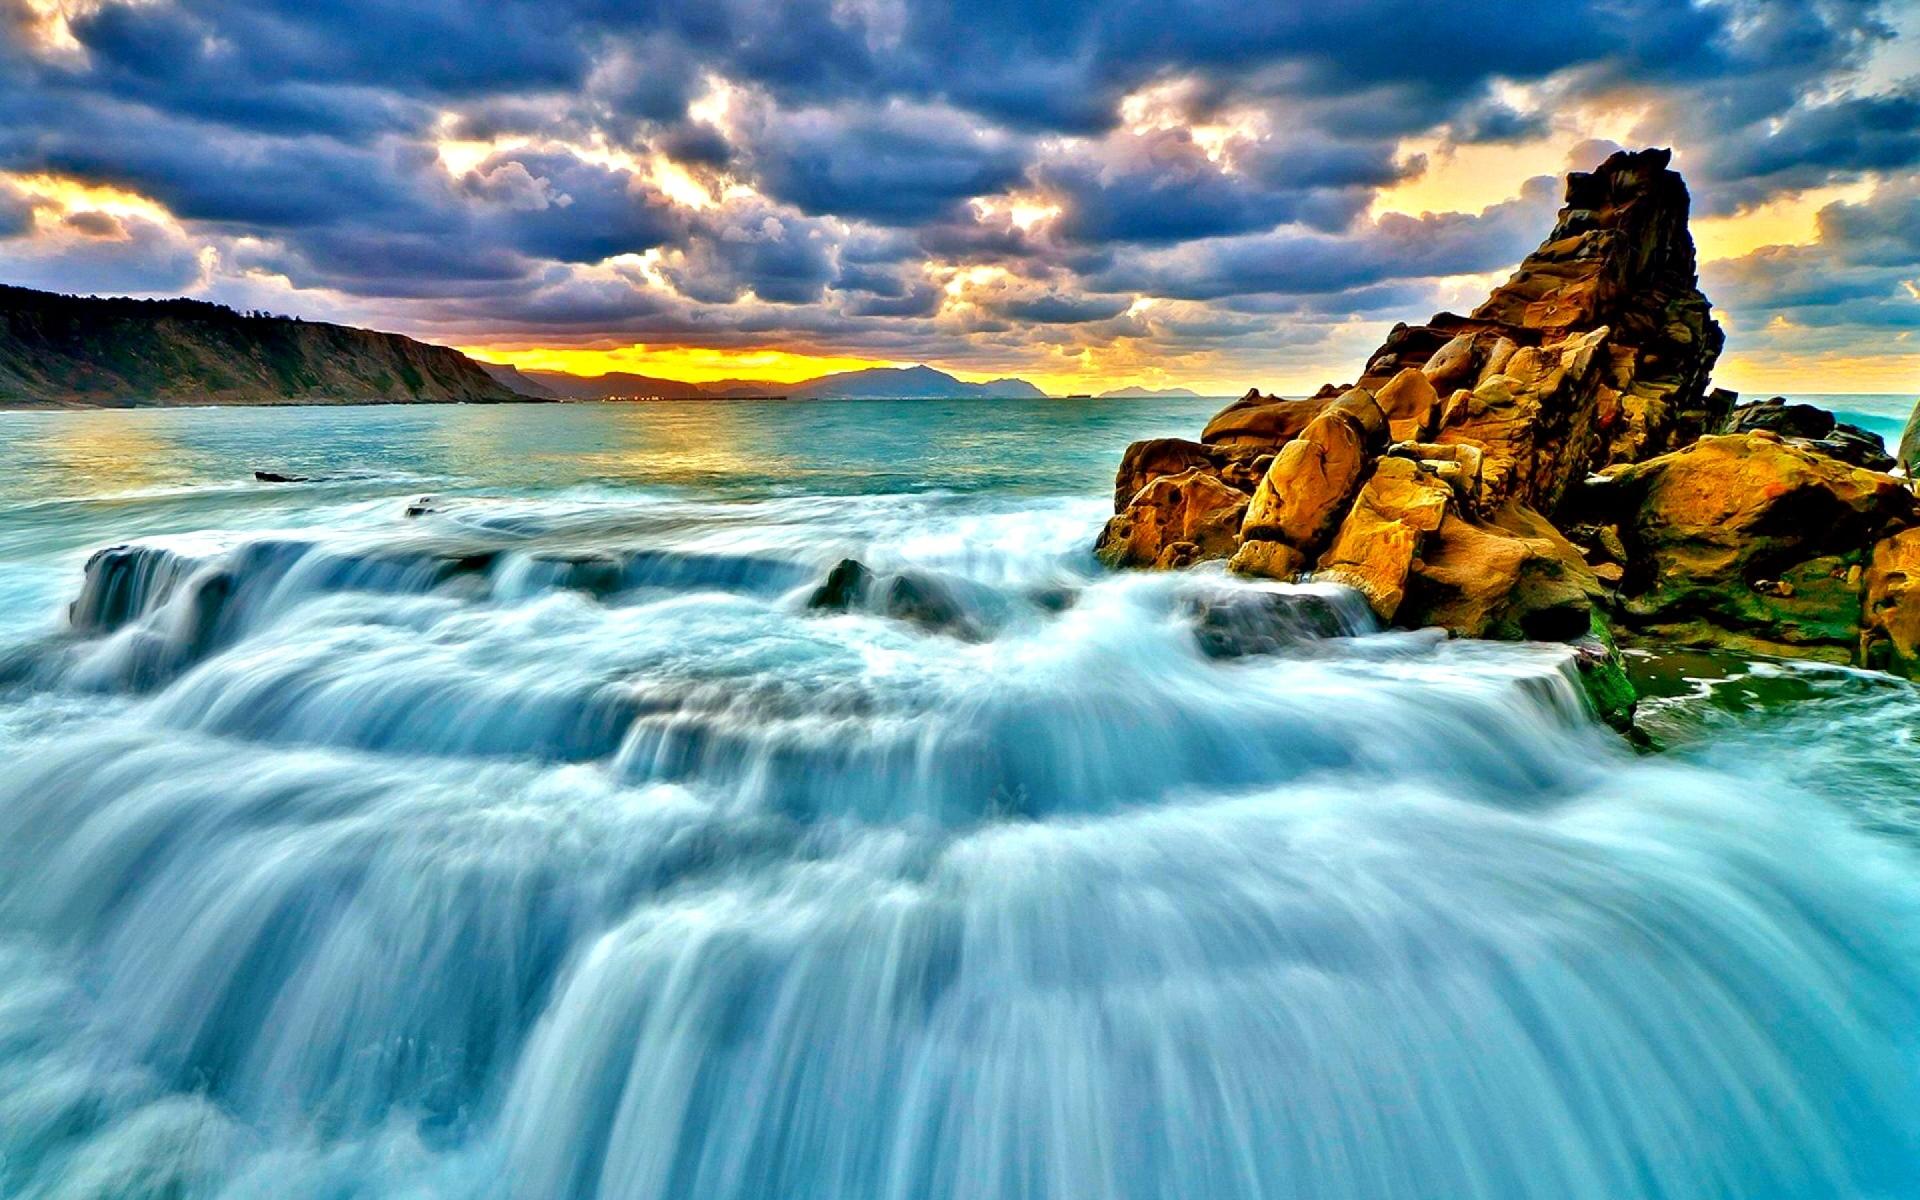 Numa Falls Wallpaper Fondos De Pantalla De Playas Wallpapers Beach Gratis